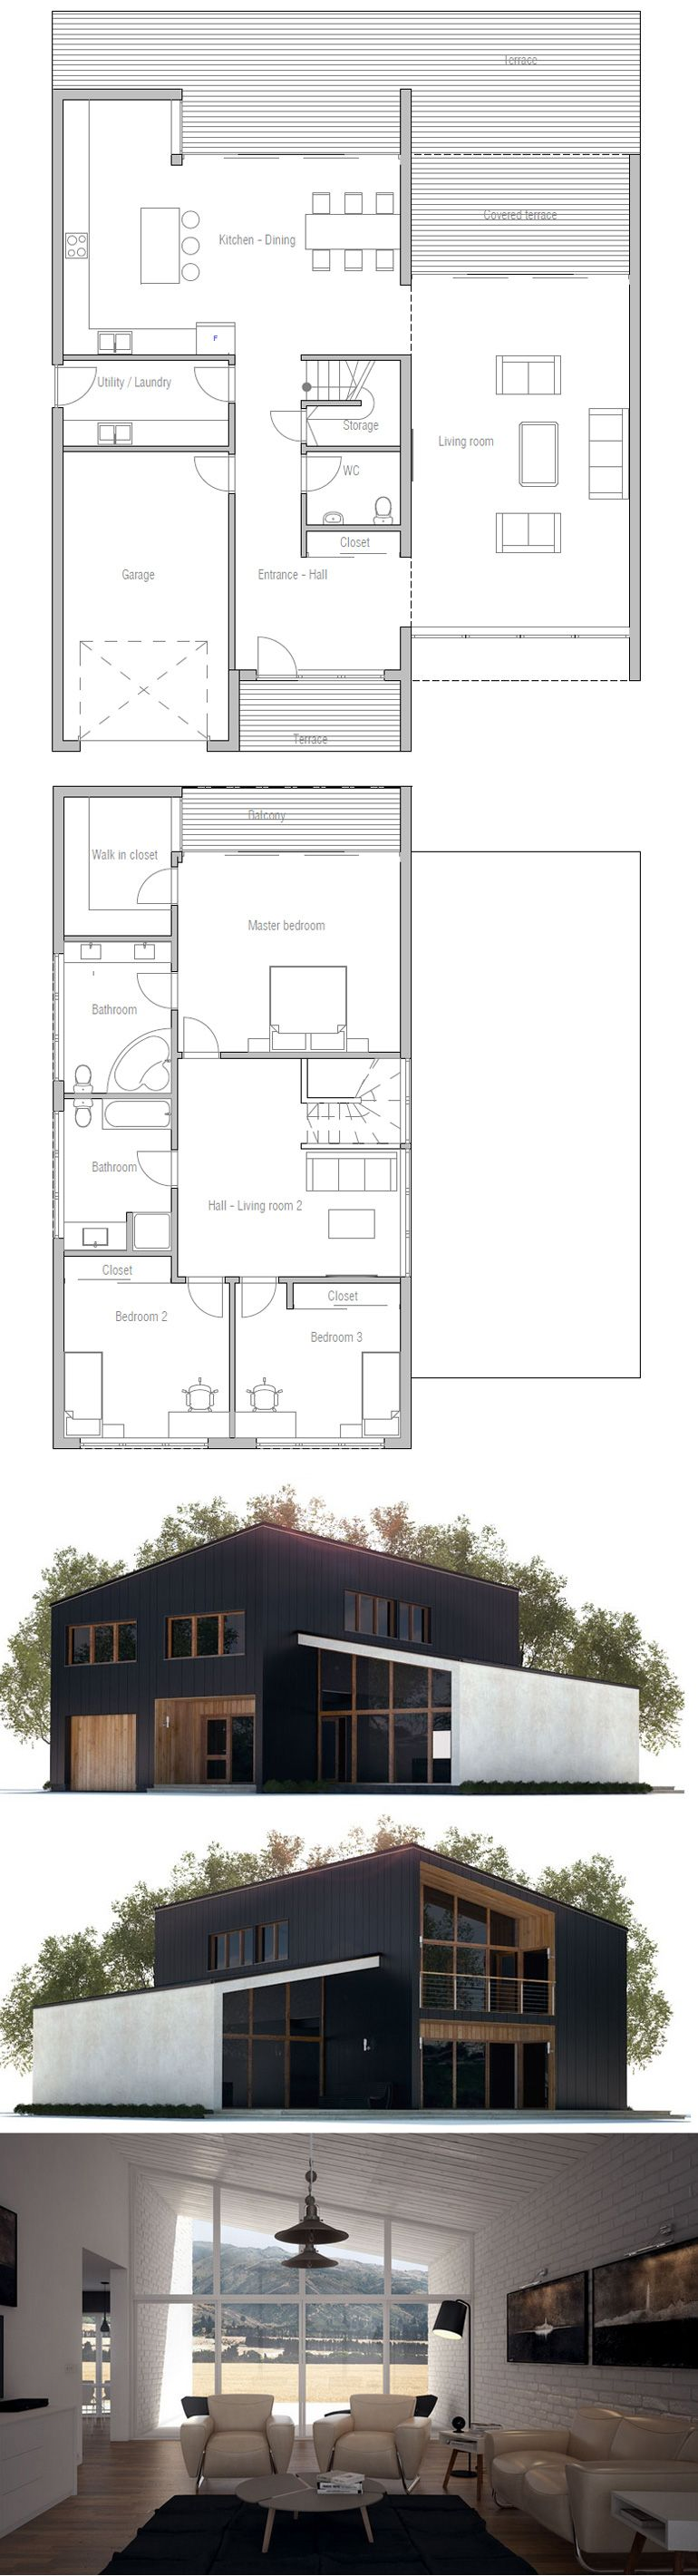 grundriss grundriss pinterest grundrisse haus. Black Bedroom Furniture Sets. Home Design Ideas